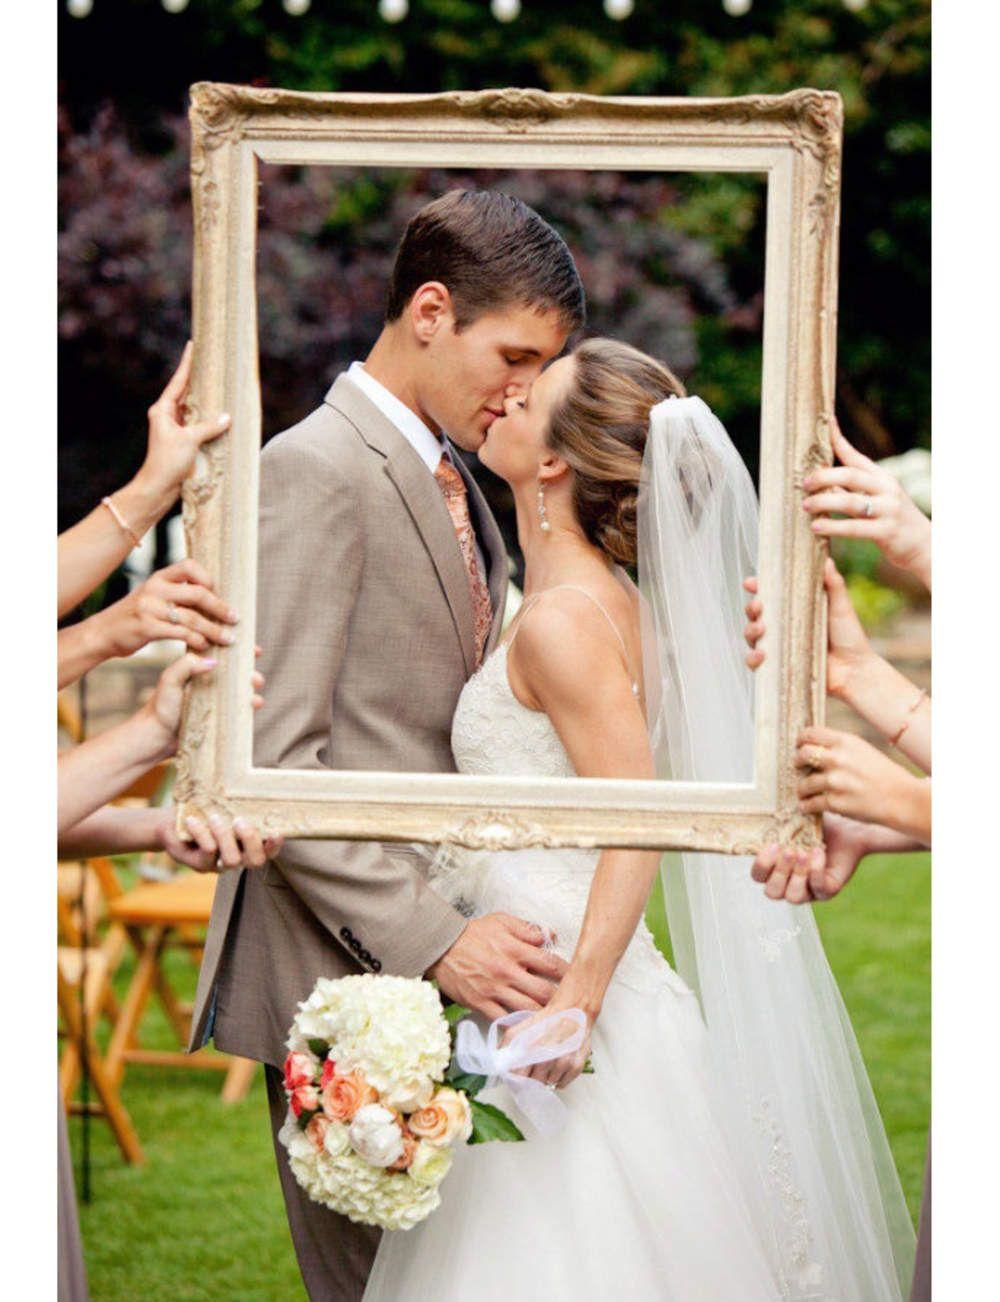 Célèbre Mariage : 10 idées de photos de couple originales | Photos de  OJ78